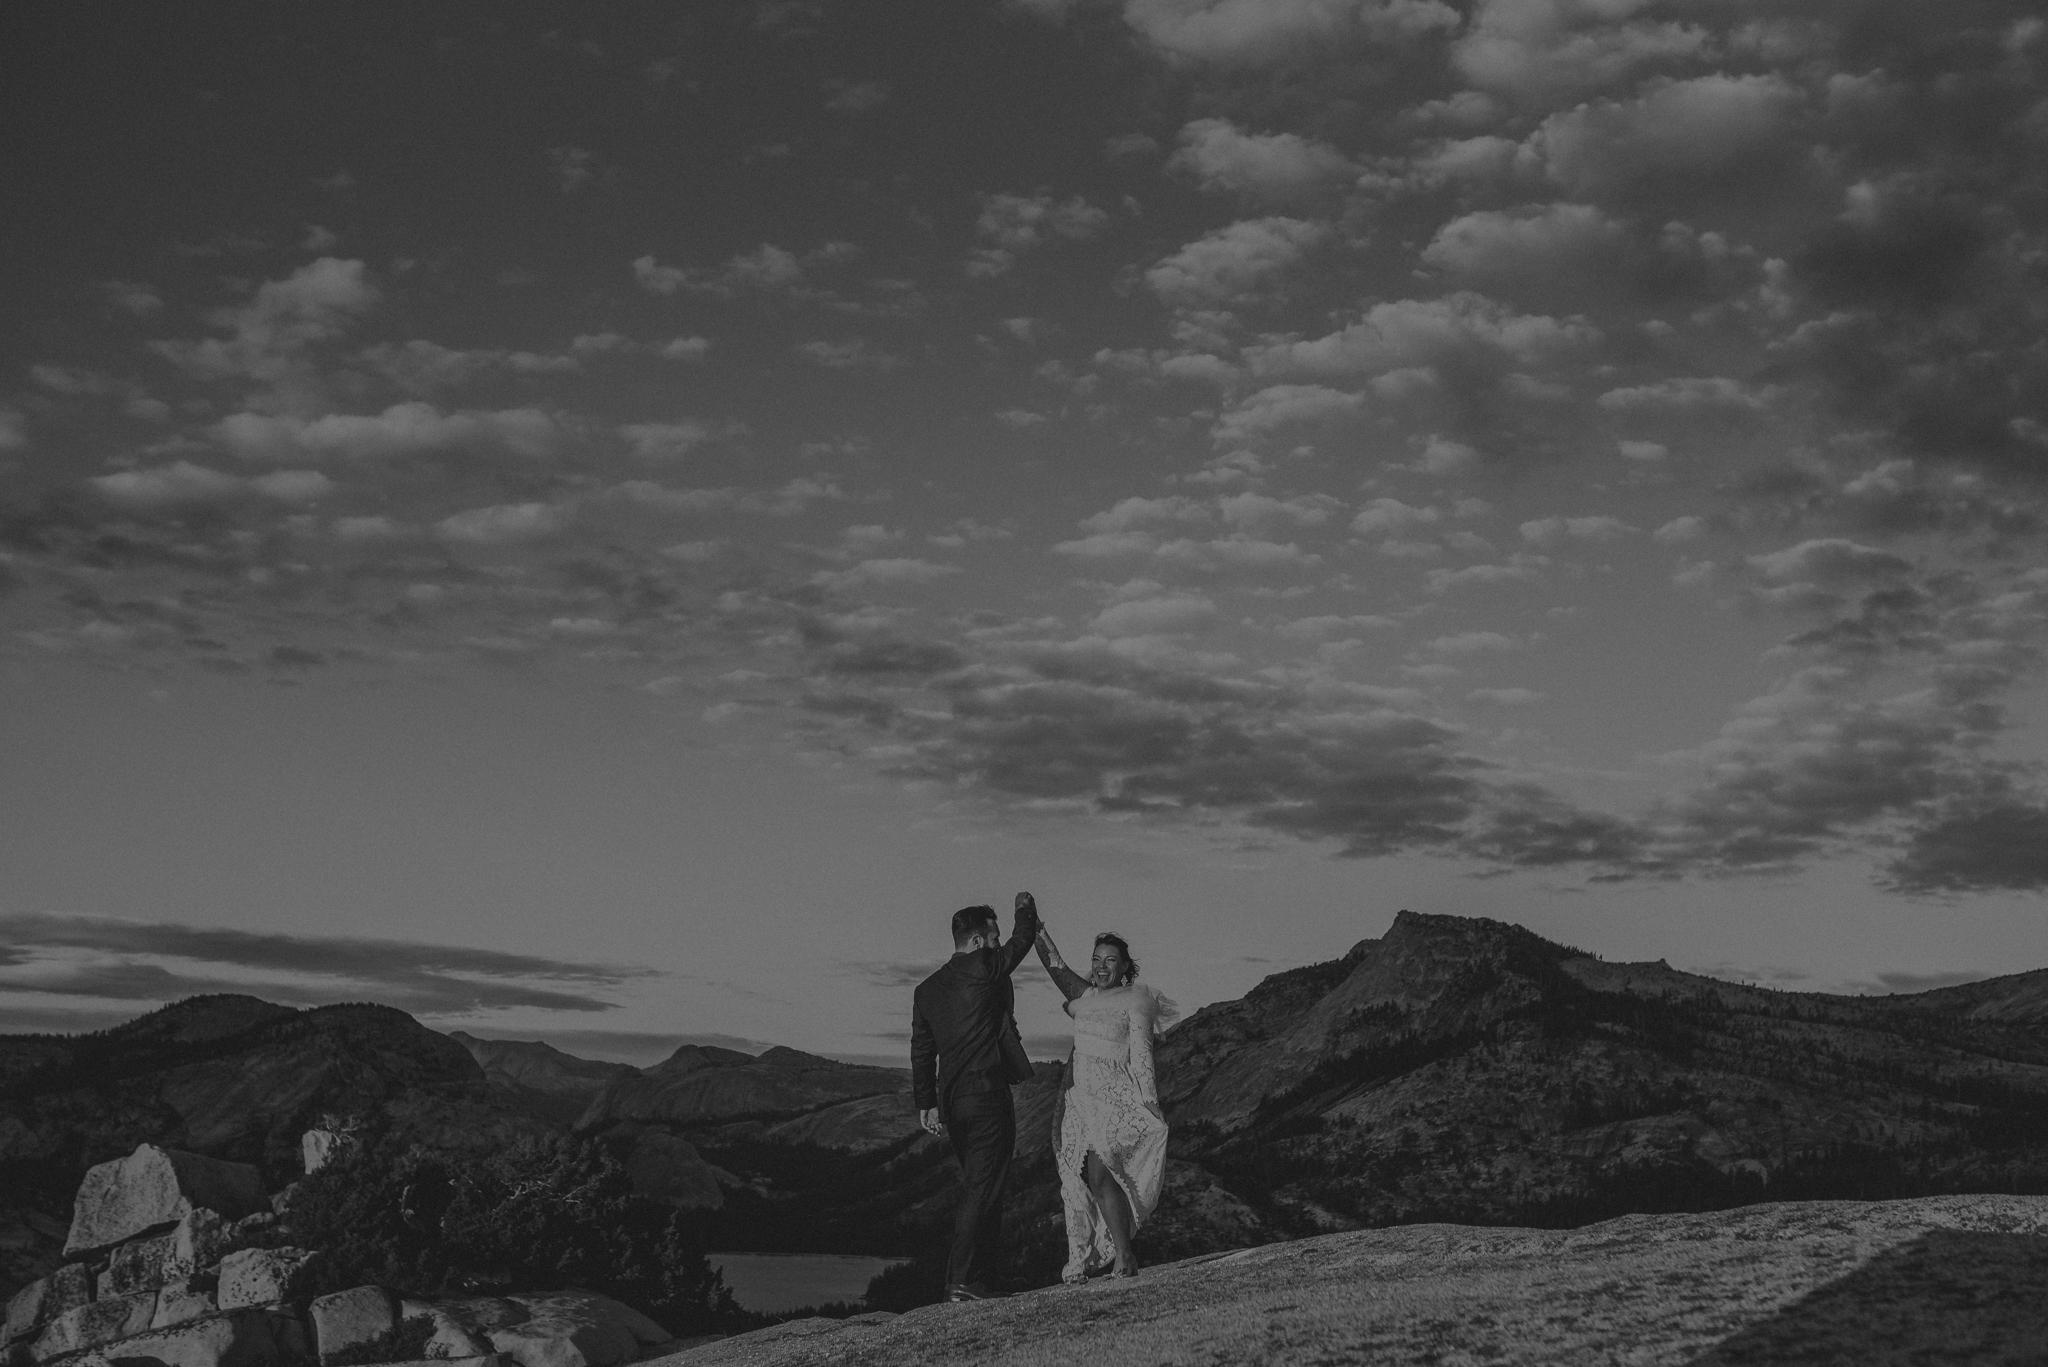 Yosemite Elopement Photographer - Evergreen Lodge Wedding Photographer - IsaiahAndTaylor.com-043.jpg